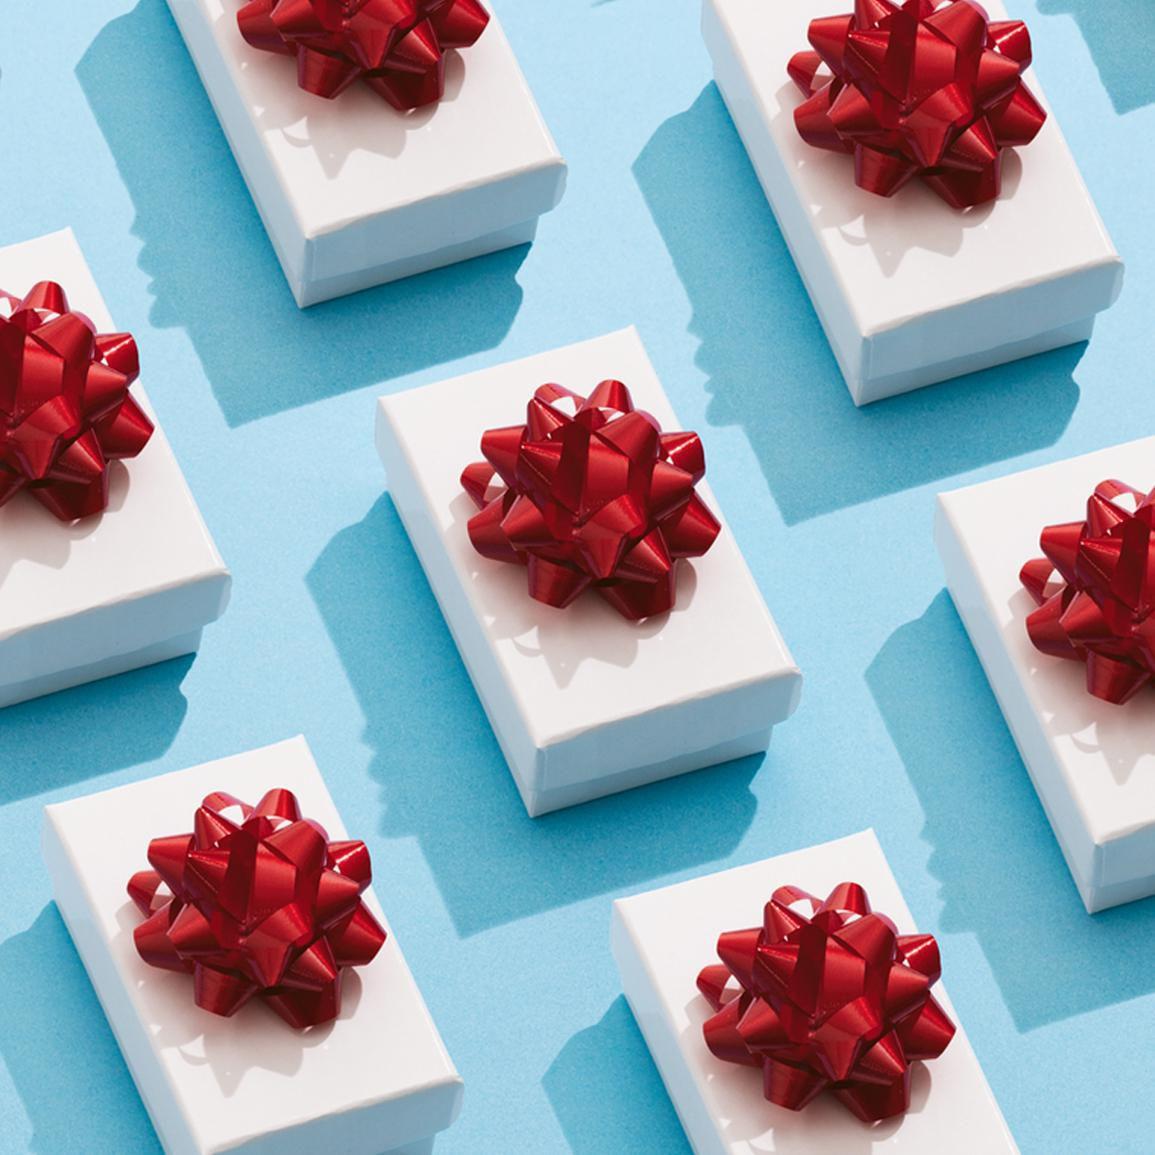 Wedding Gift Wrap Etiquette: Wedding Gift Etiquette: When Do You Open Gifts?